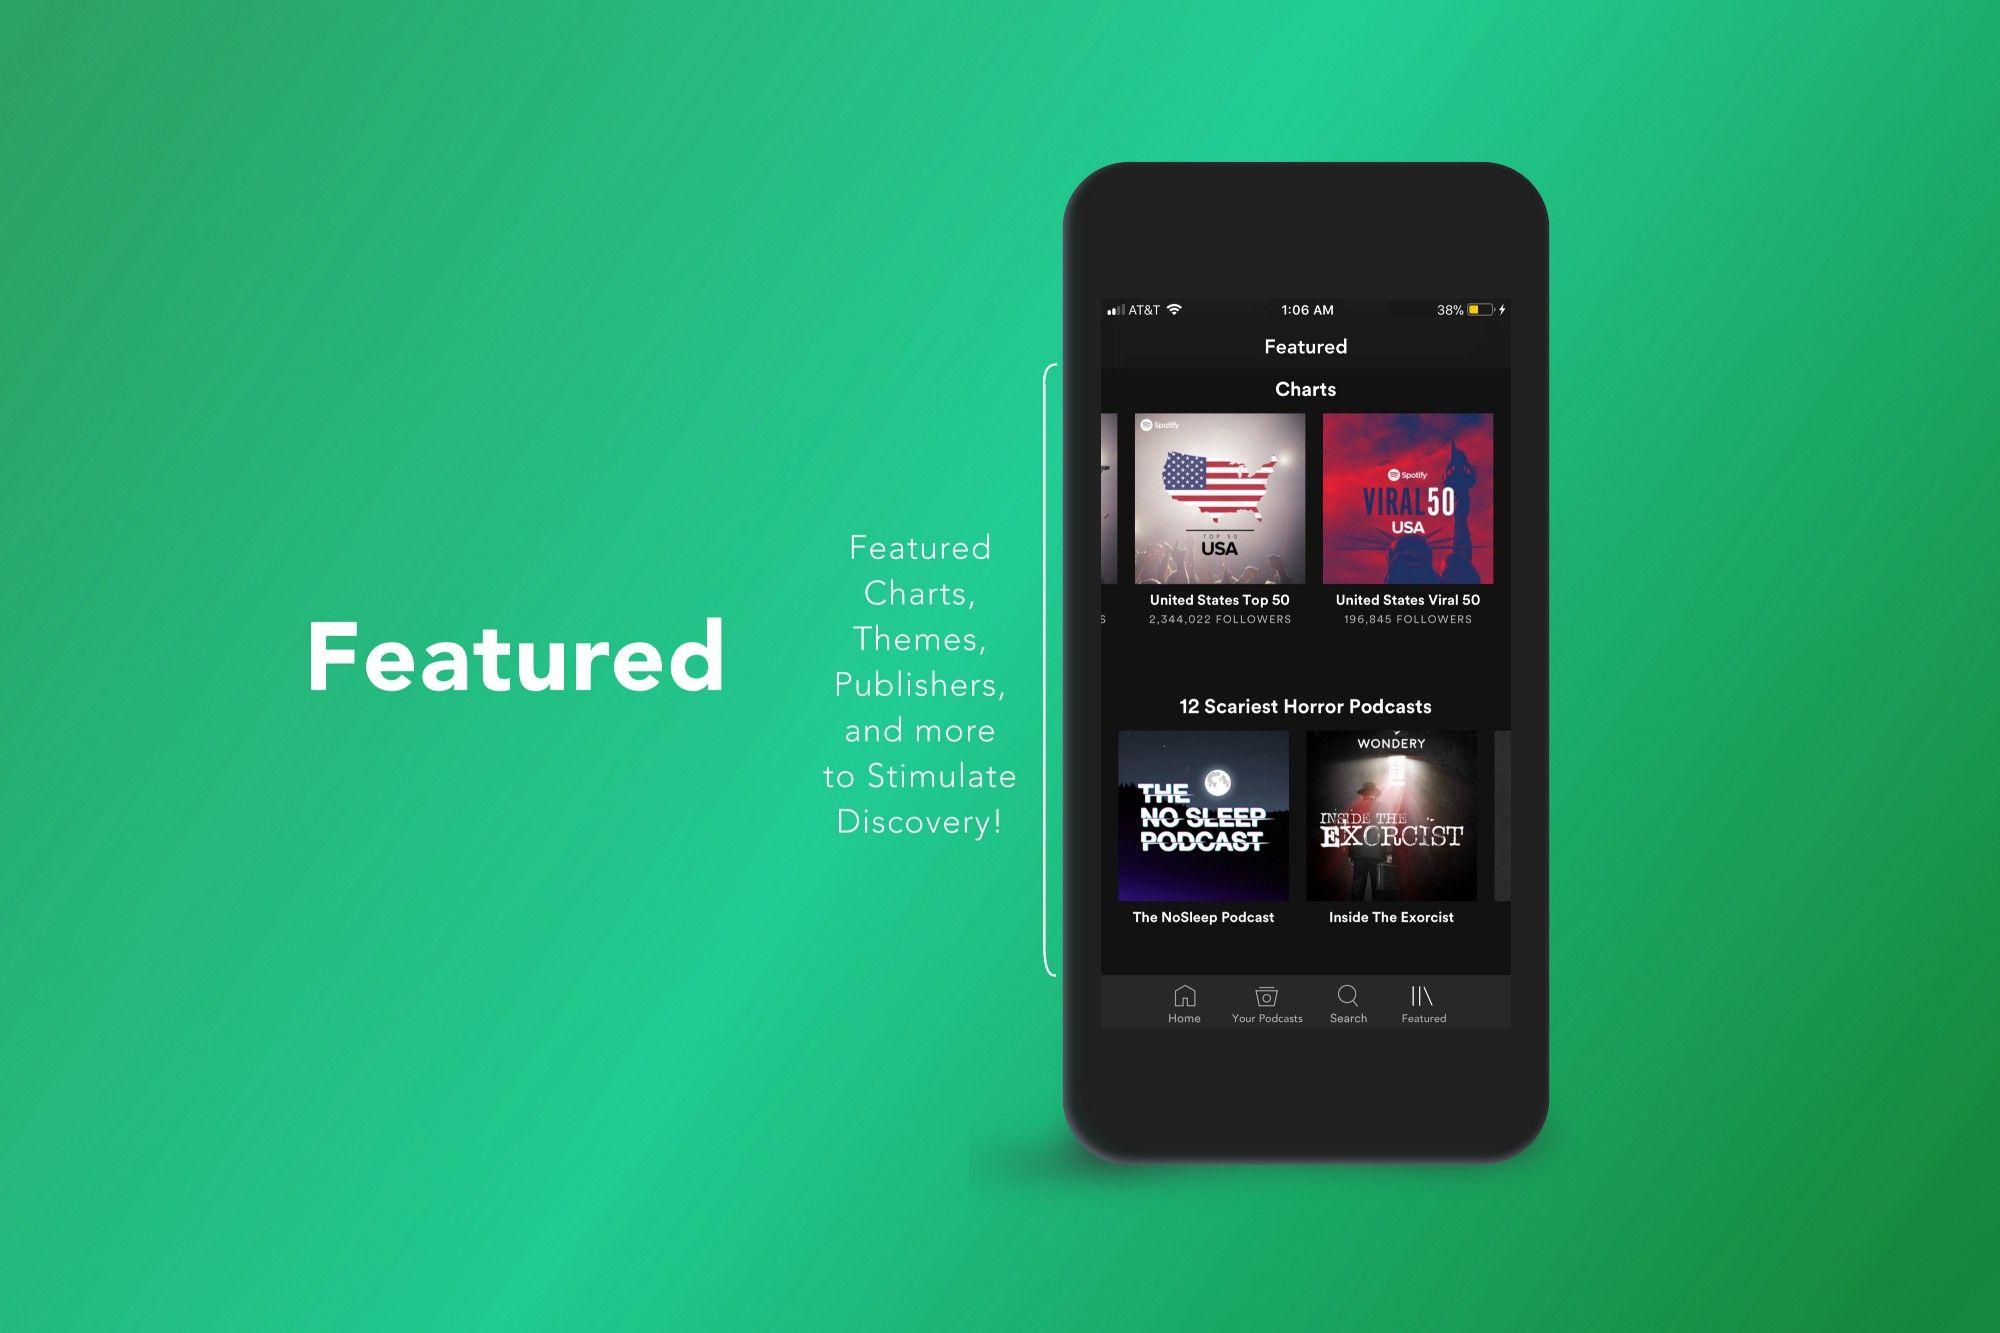 Image Result For Spotify Mockup Psd Spotify Design Mockup Psd Spotify